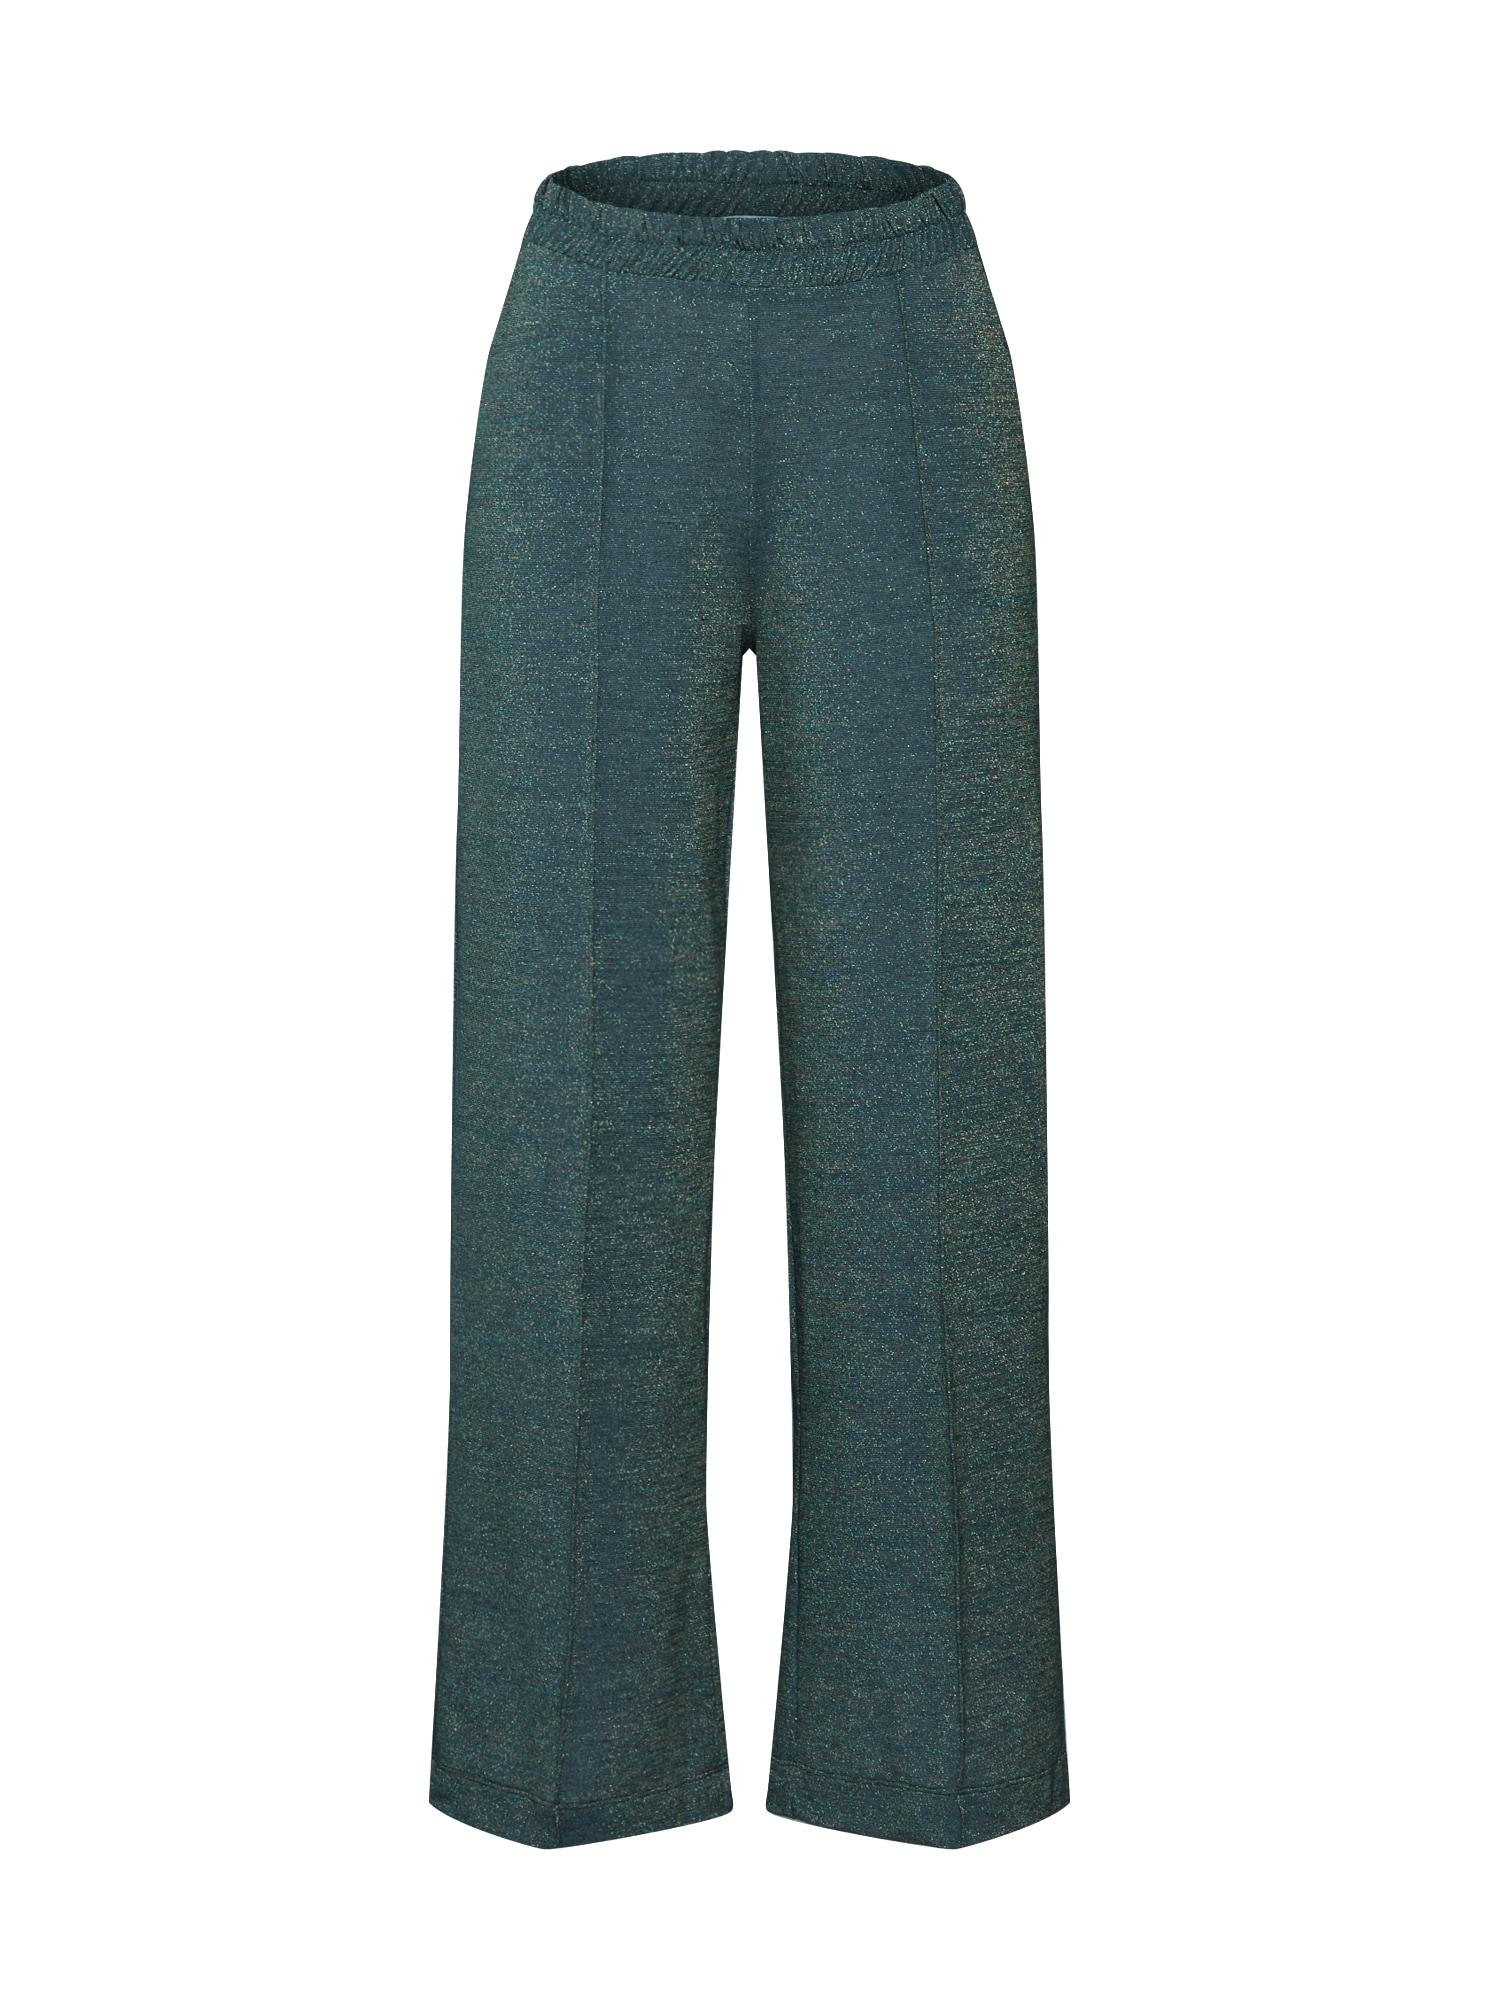 EDITED Kelnės su kantu 'Annina' margai žalia / tamsiai žalia